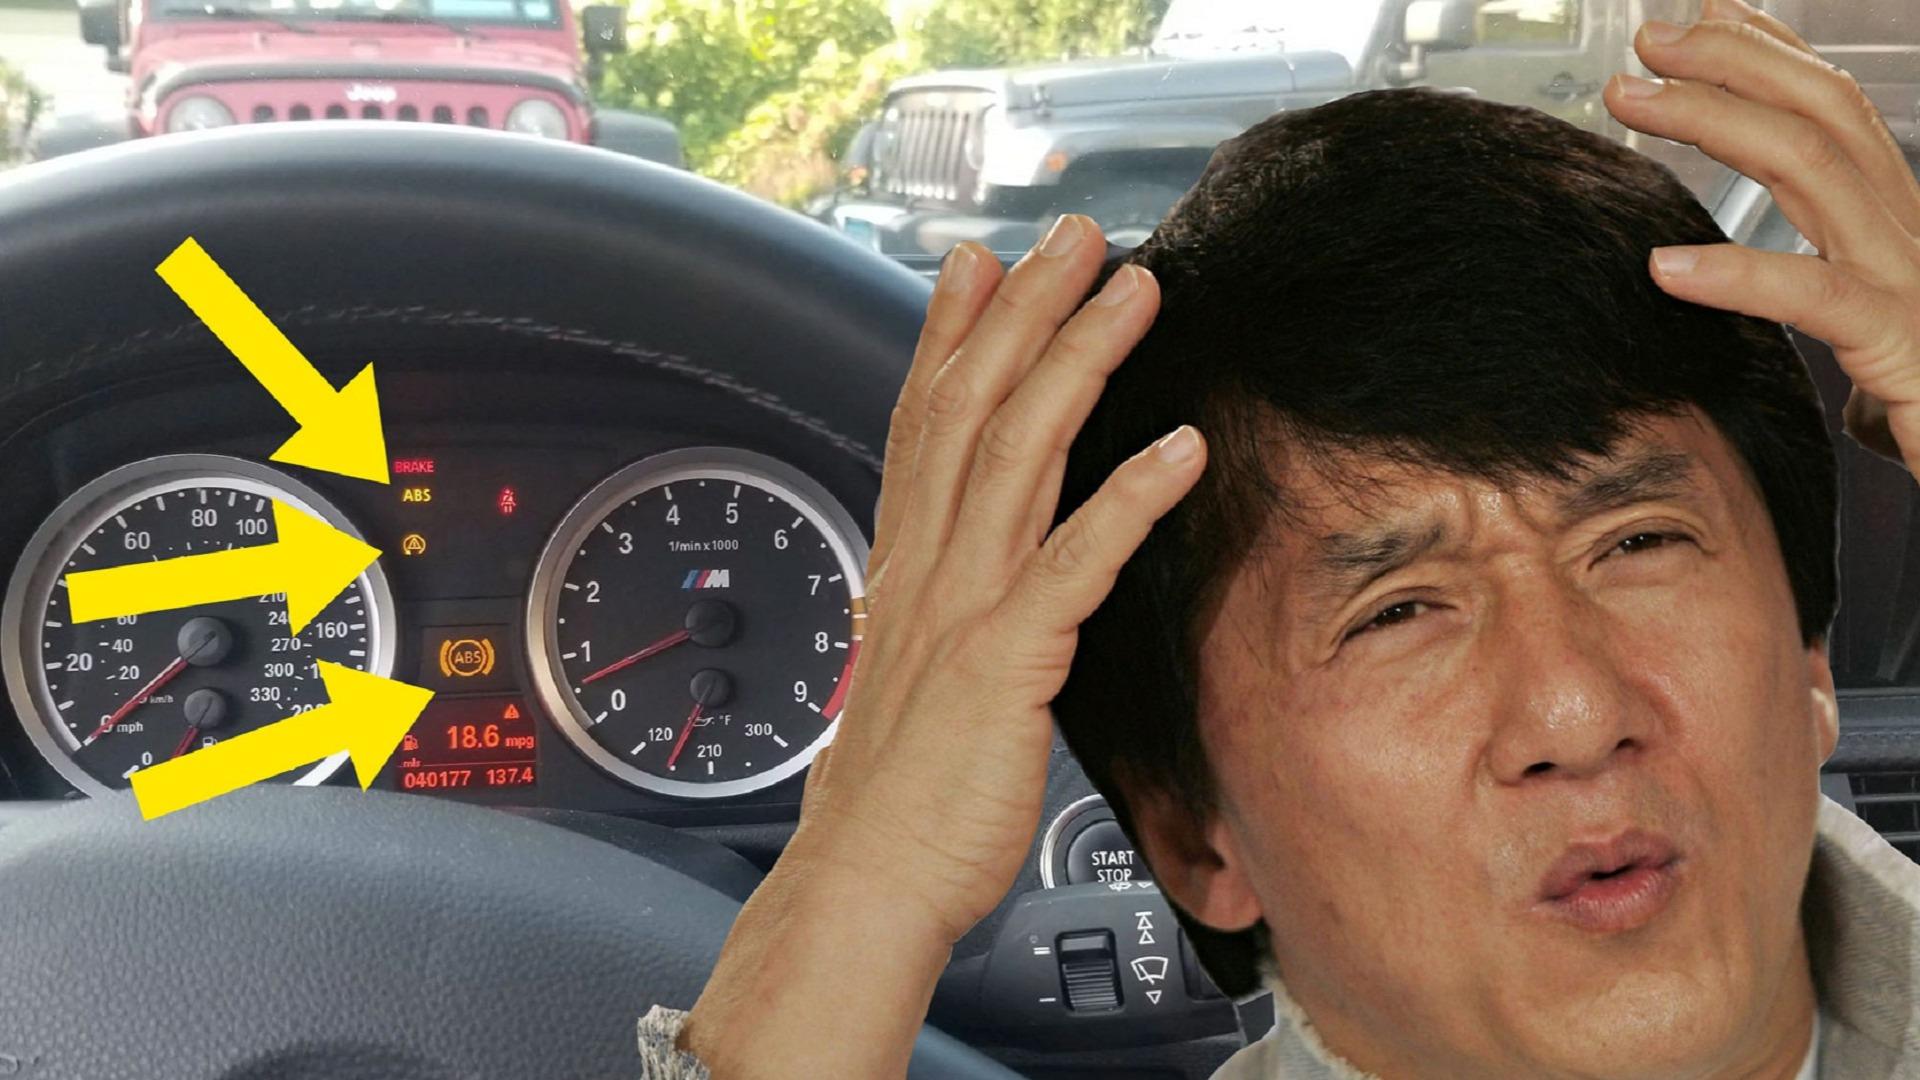 How To Troubleshoot And Replace A BMW E82, E88, E90, E91, & E92 ABS Wheel Speed Sensor